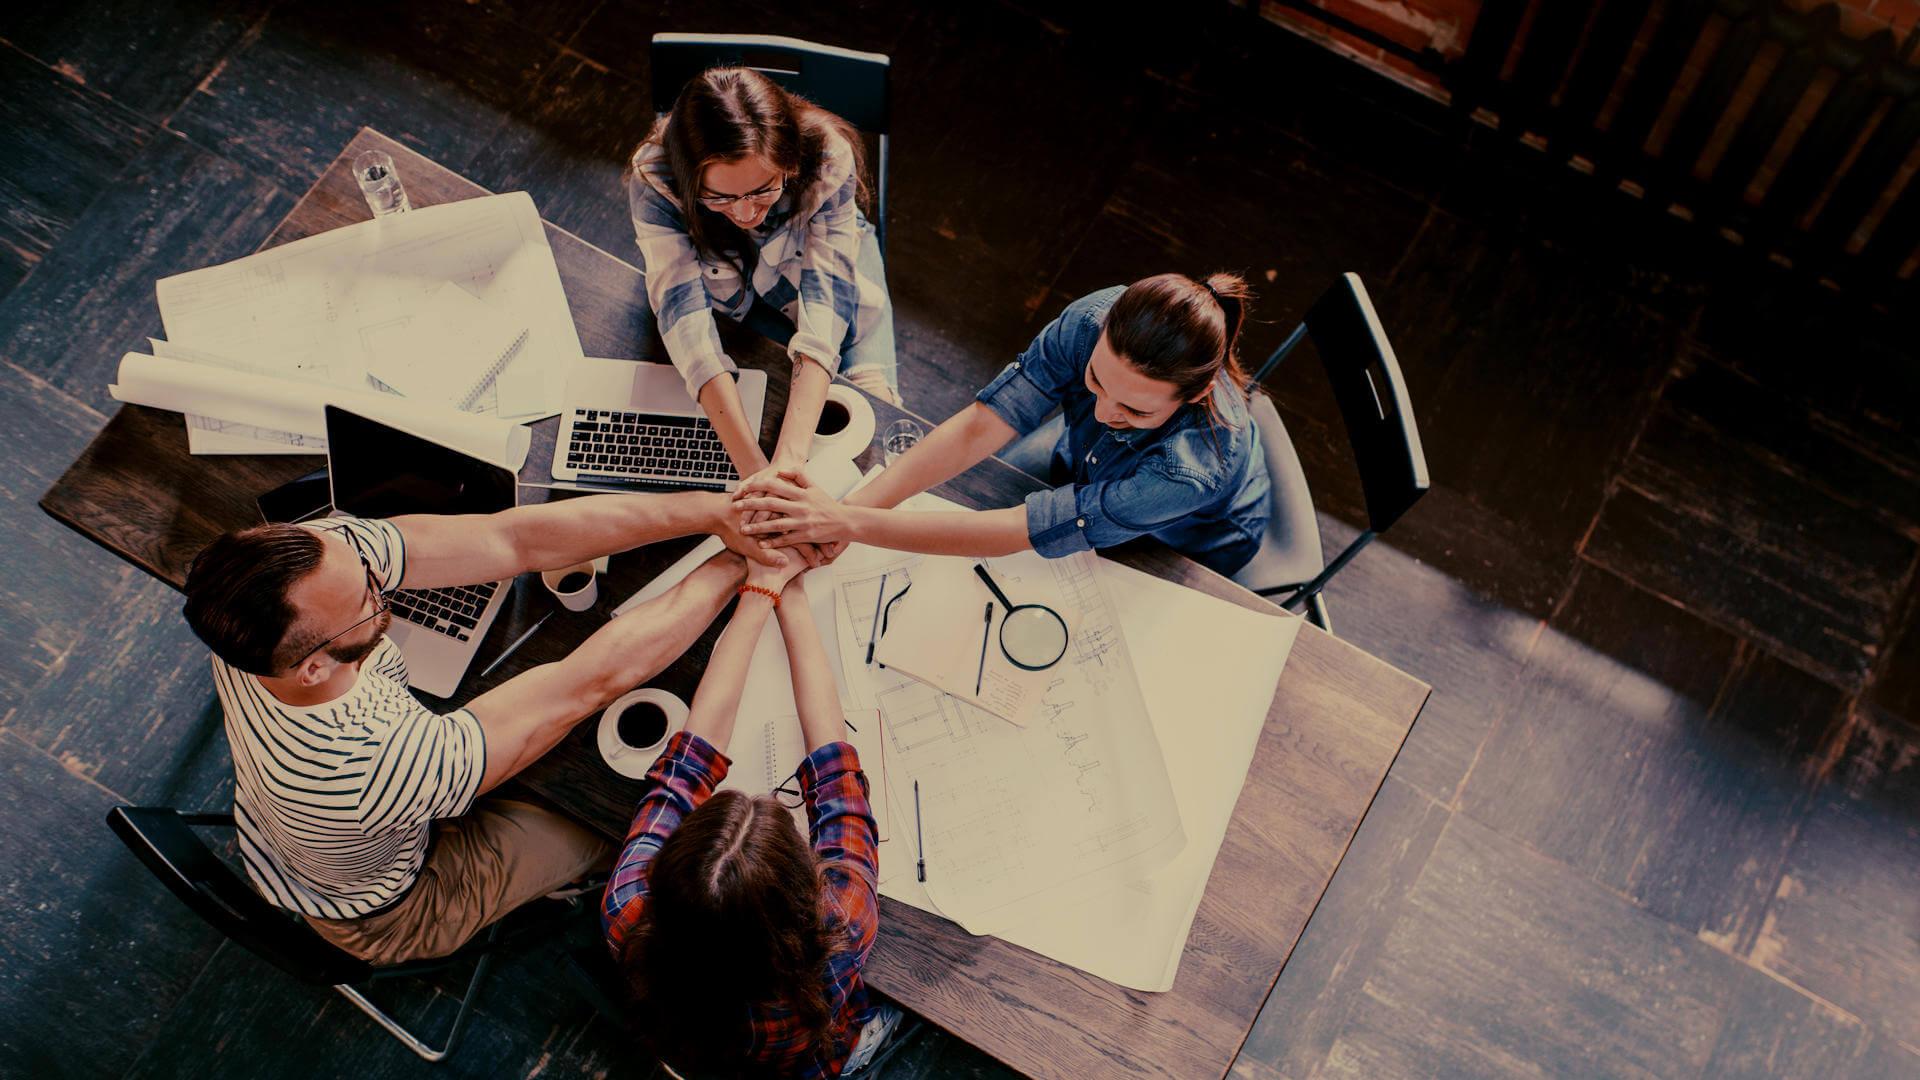 Keeping focus tip #3: Delegate